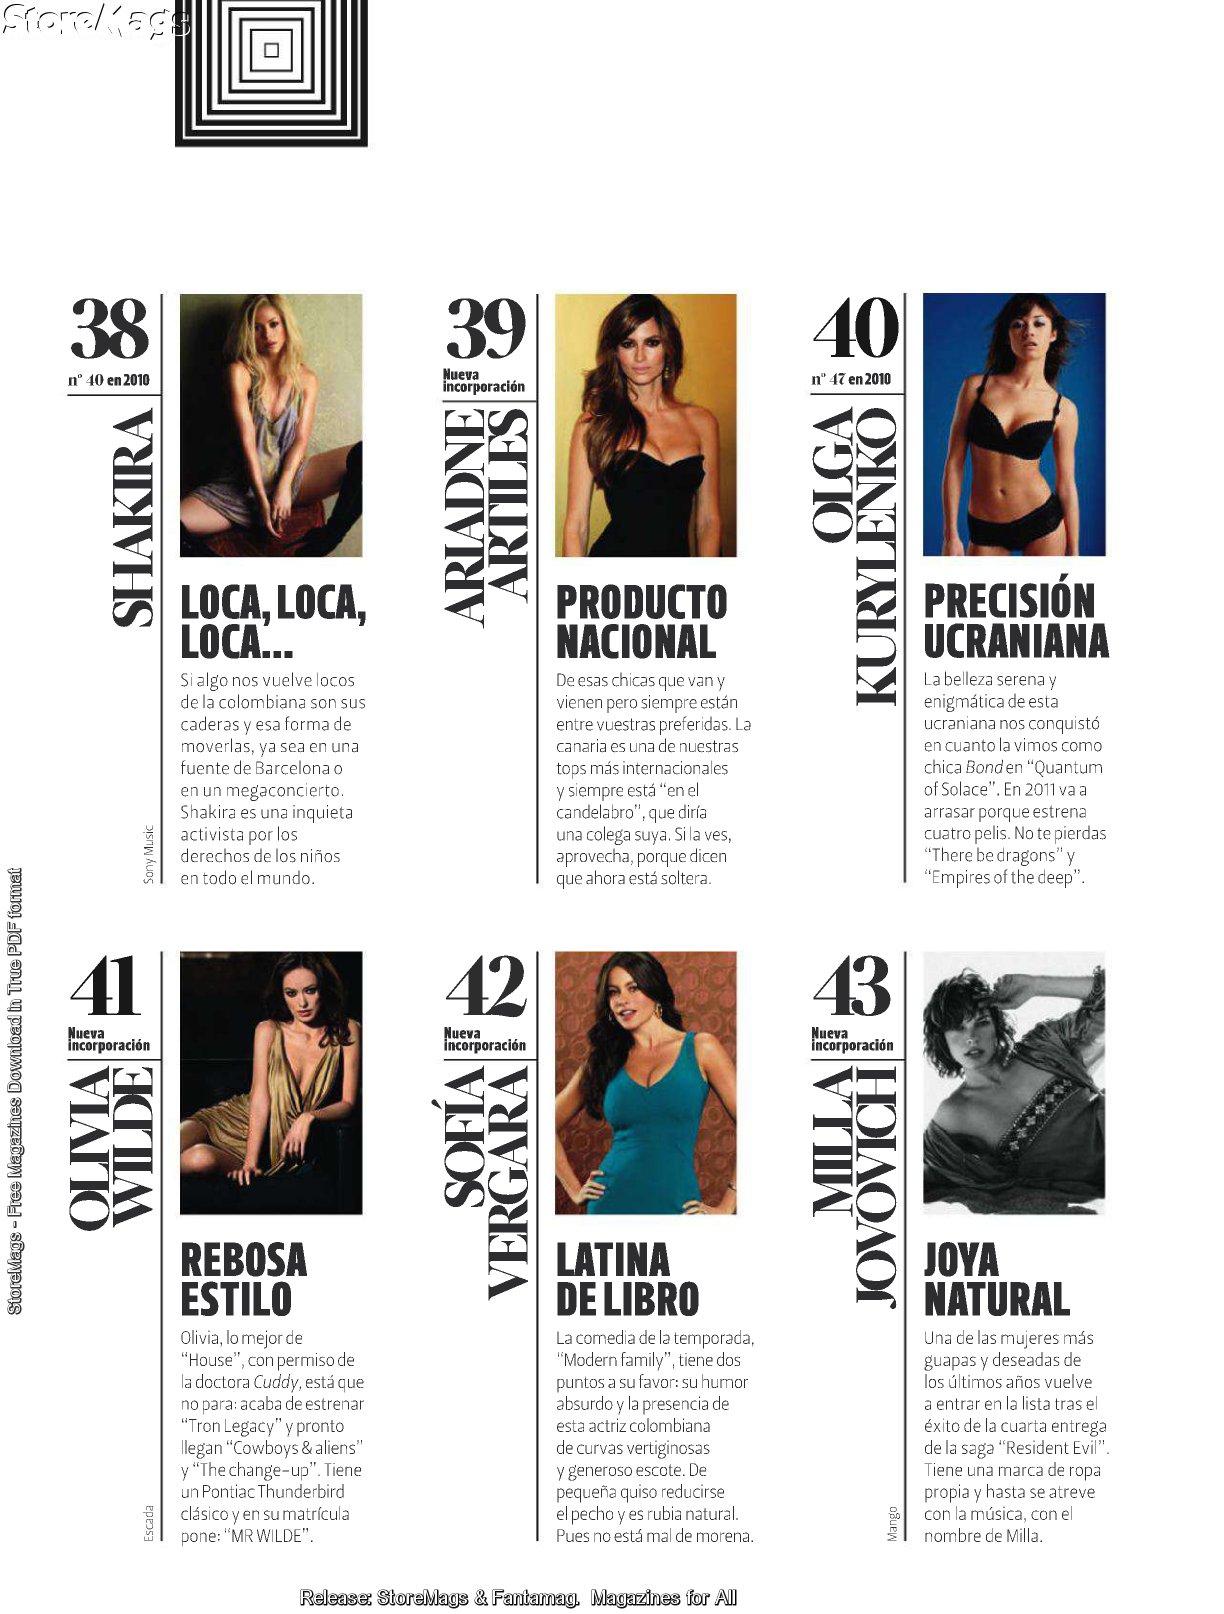 55616_septimiu29_TOP50SexiestWomenOfTheWorld_DTSpain_Feb201123_122_195lo.jpg